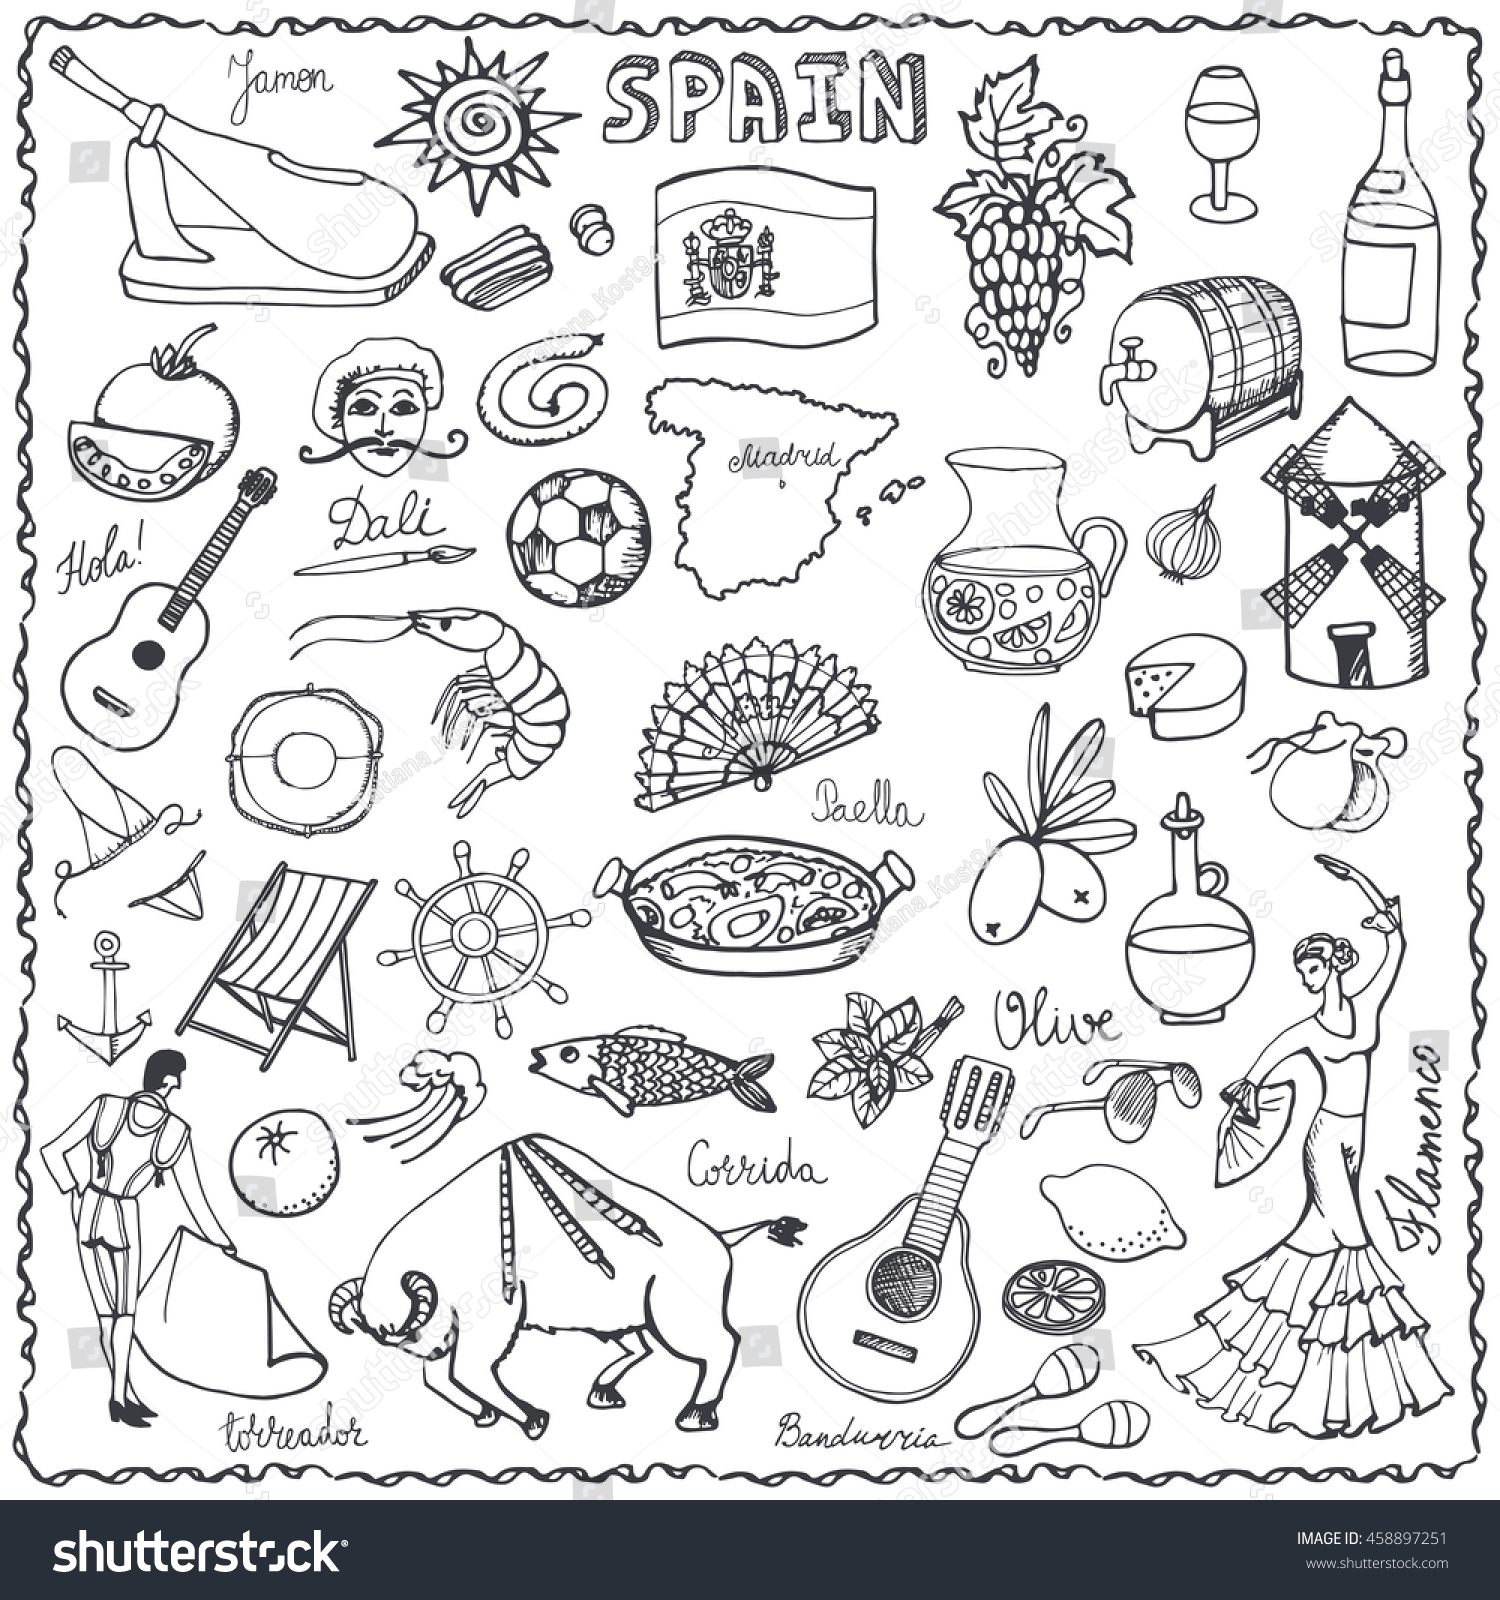 spain doodles elementsiconvector hand drawn doodle stock vector